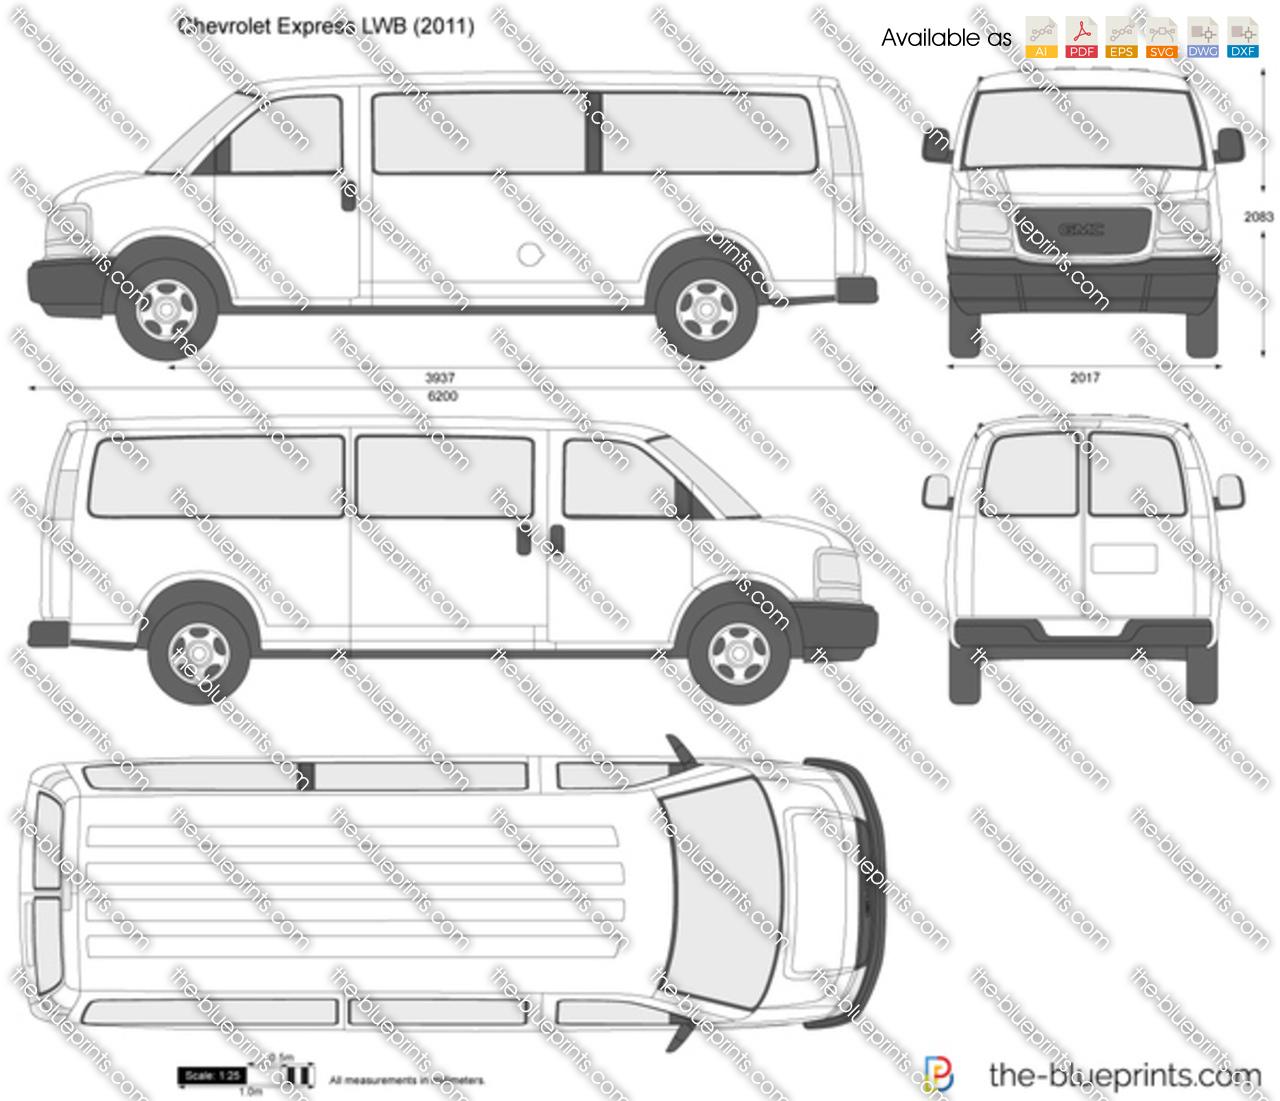 Chevrolet Express Lwb Vector Drawing